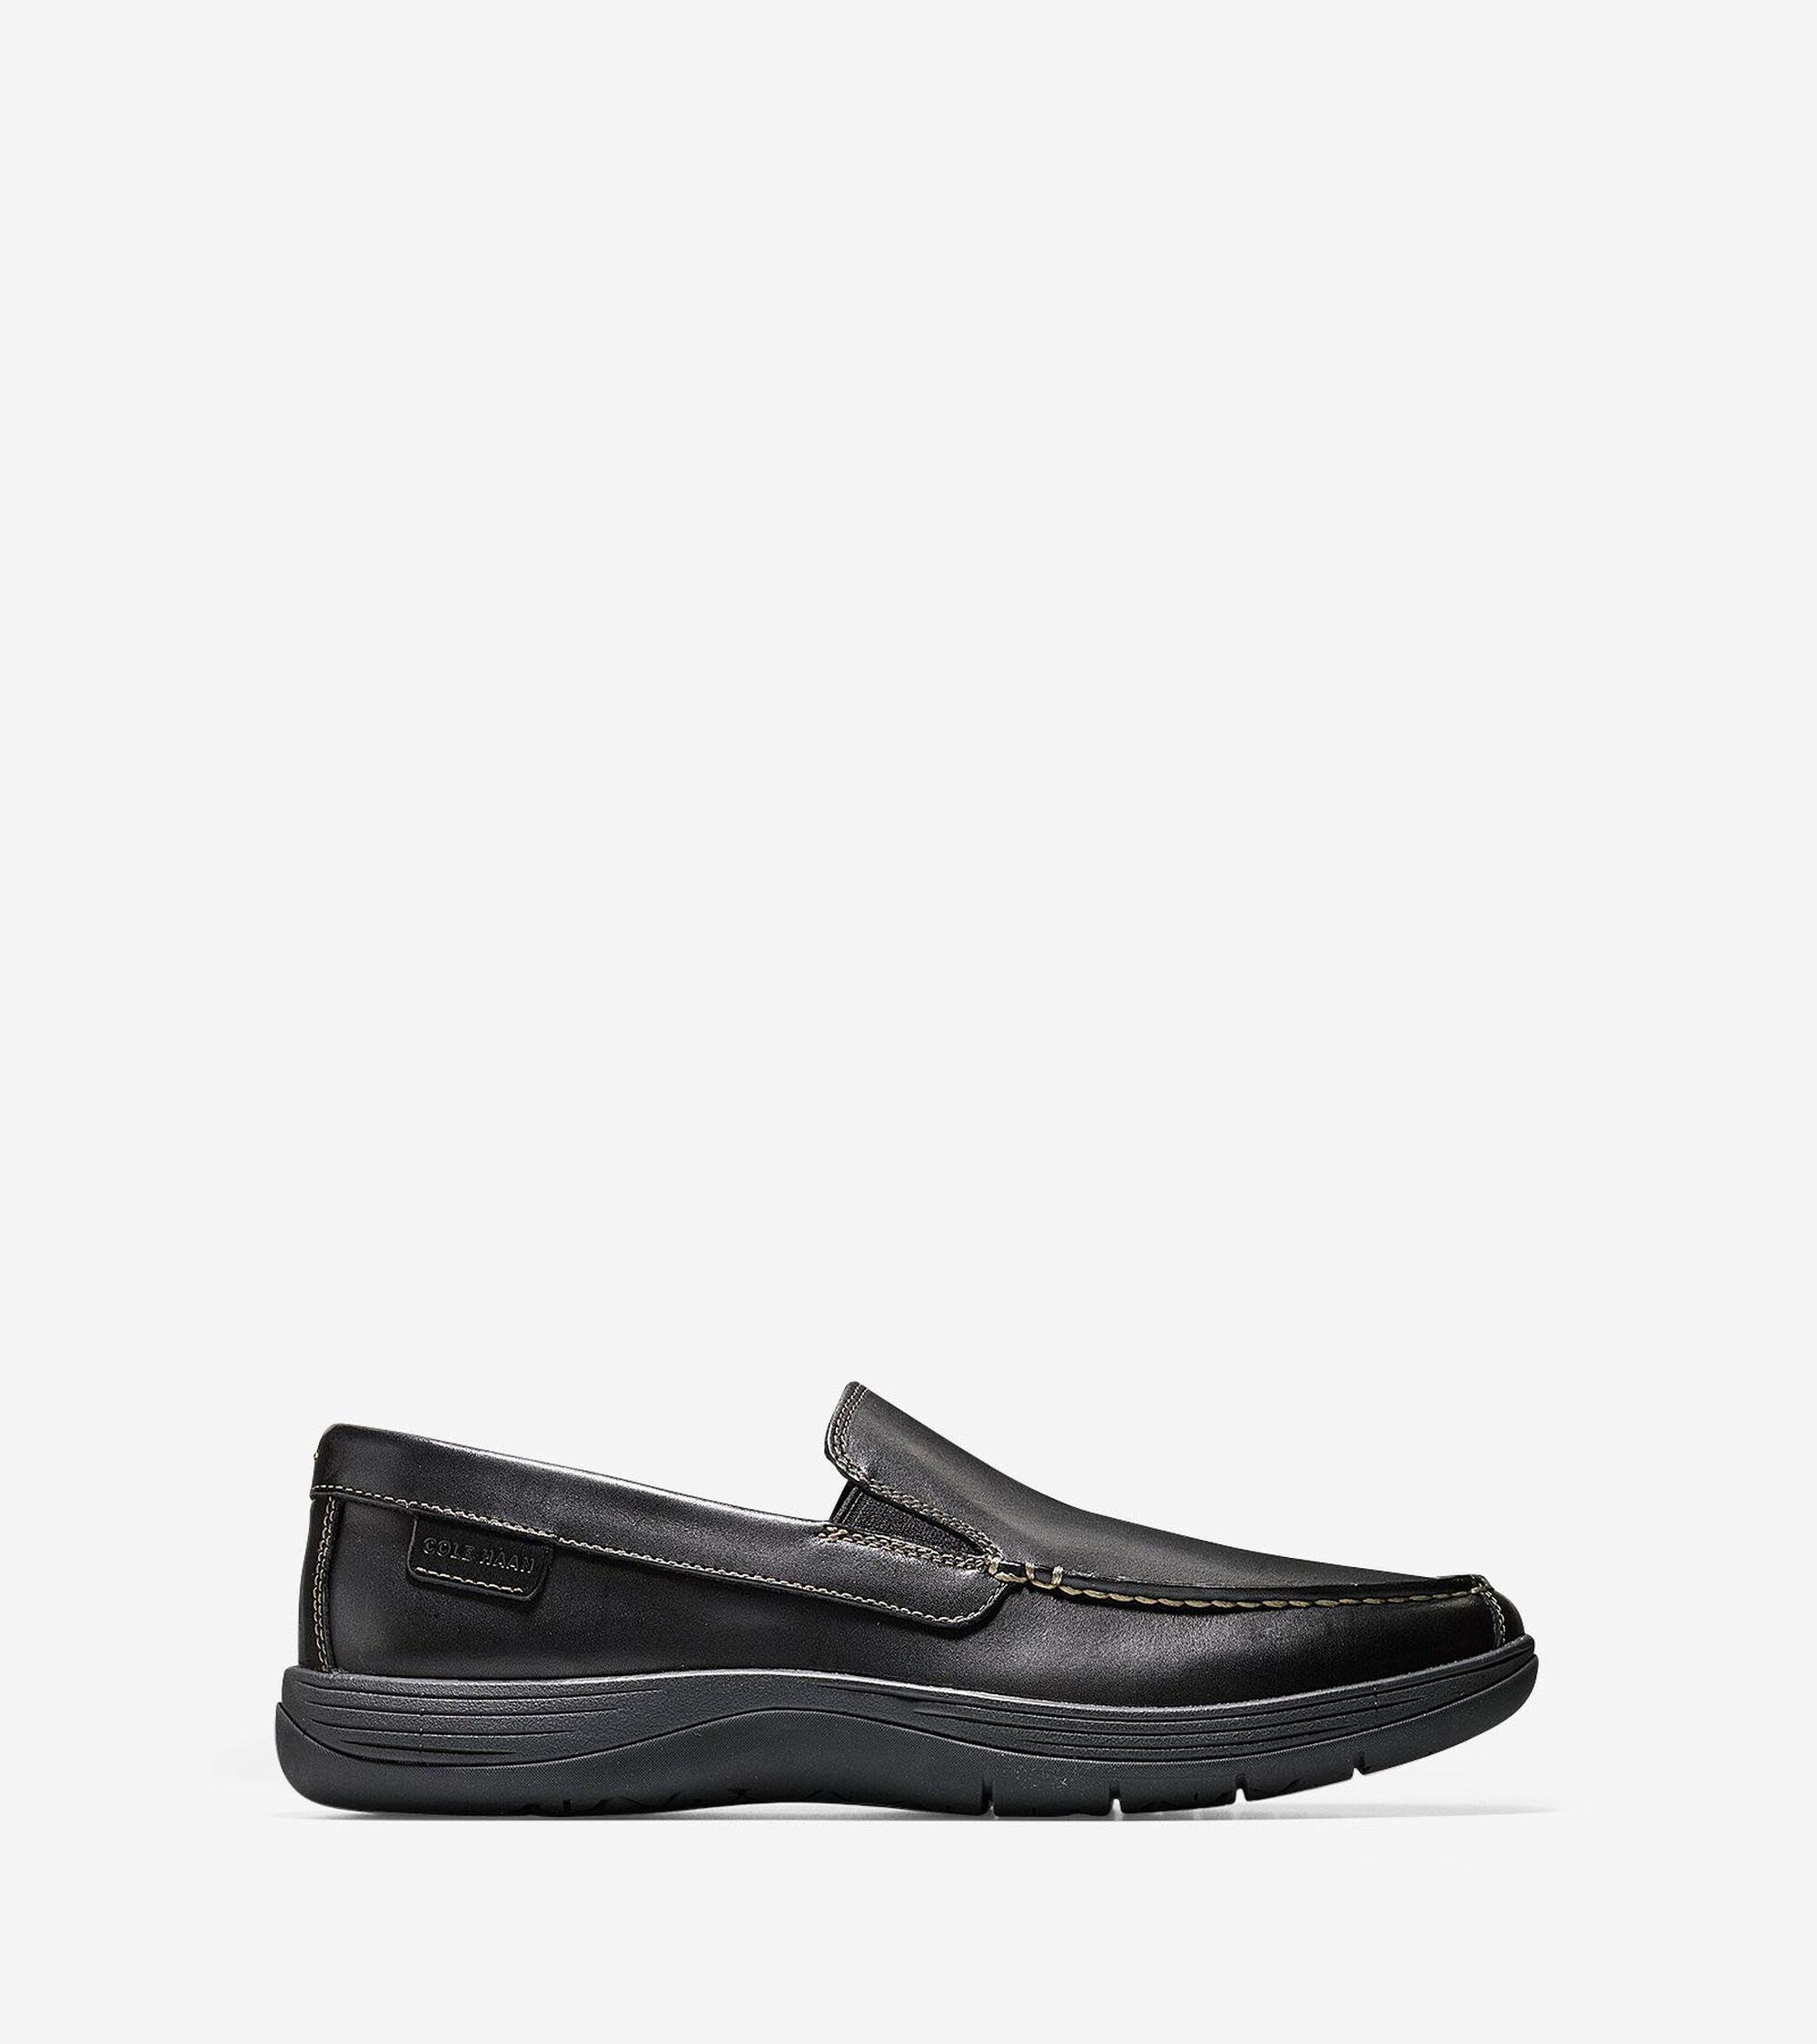 Cole Haan Lewiston Venetian Loafer